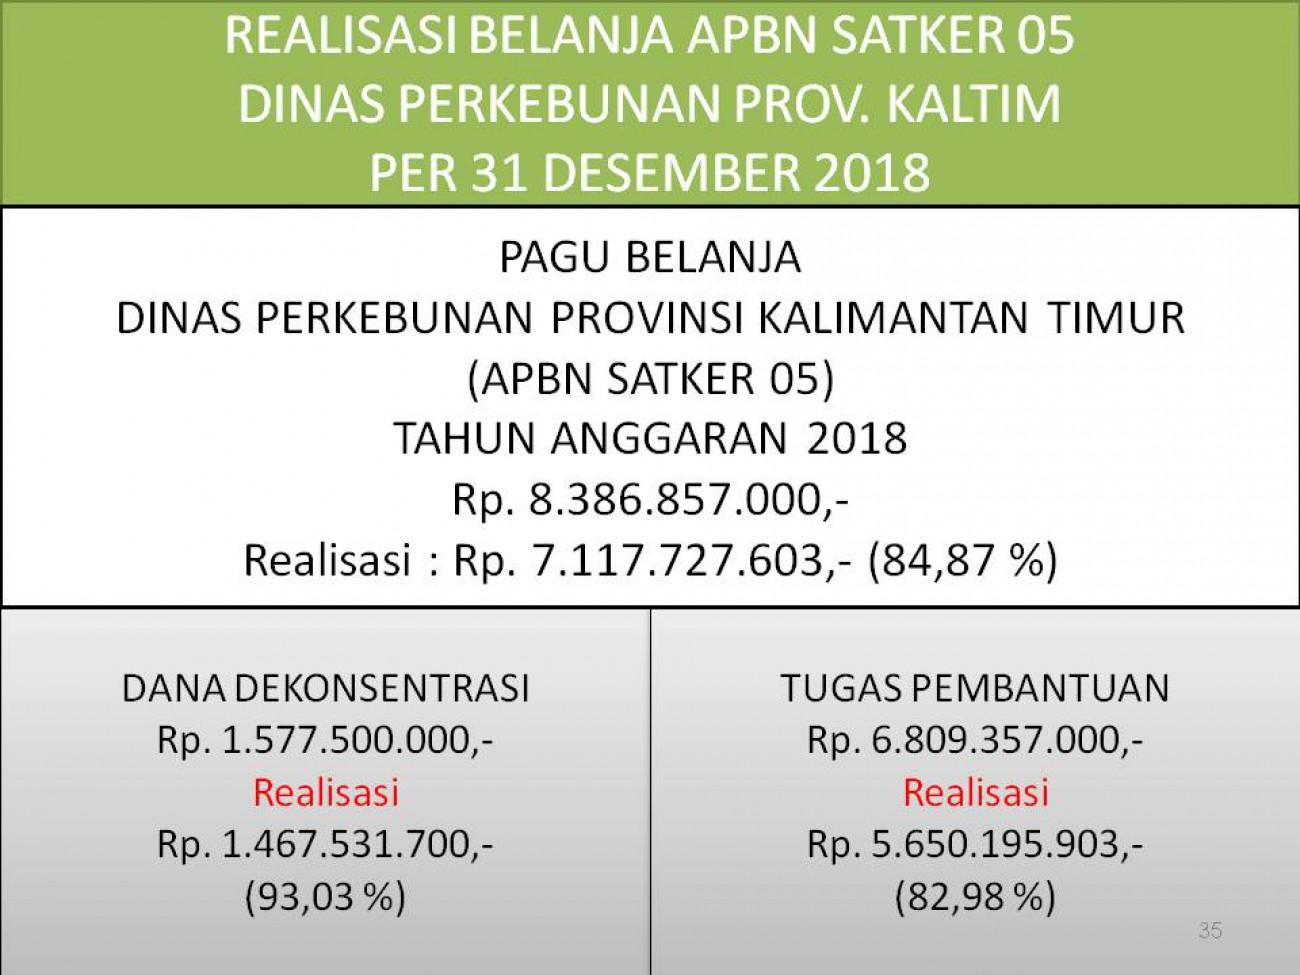 Laporan Realisasi APBN Satker 05 (Direktorat Jenderal Perkebunan) Dinas Perkebunan Prov. Kaltim Bulan Desember 2018